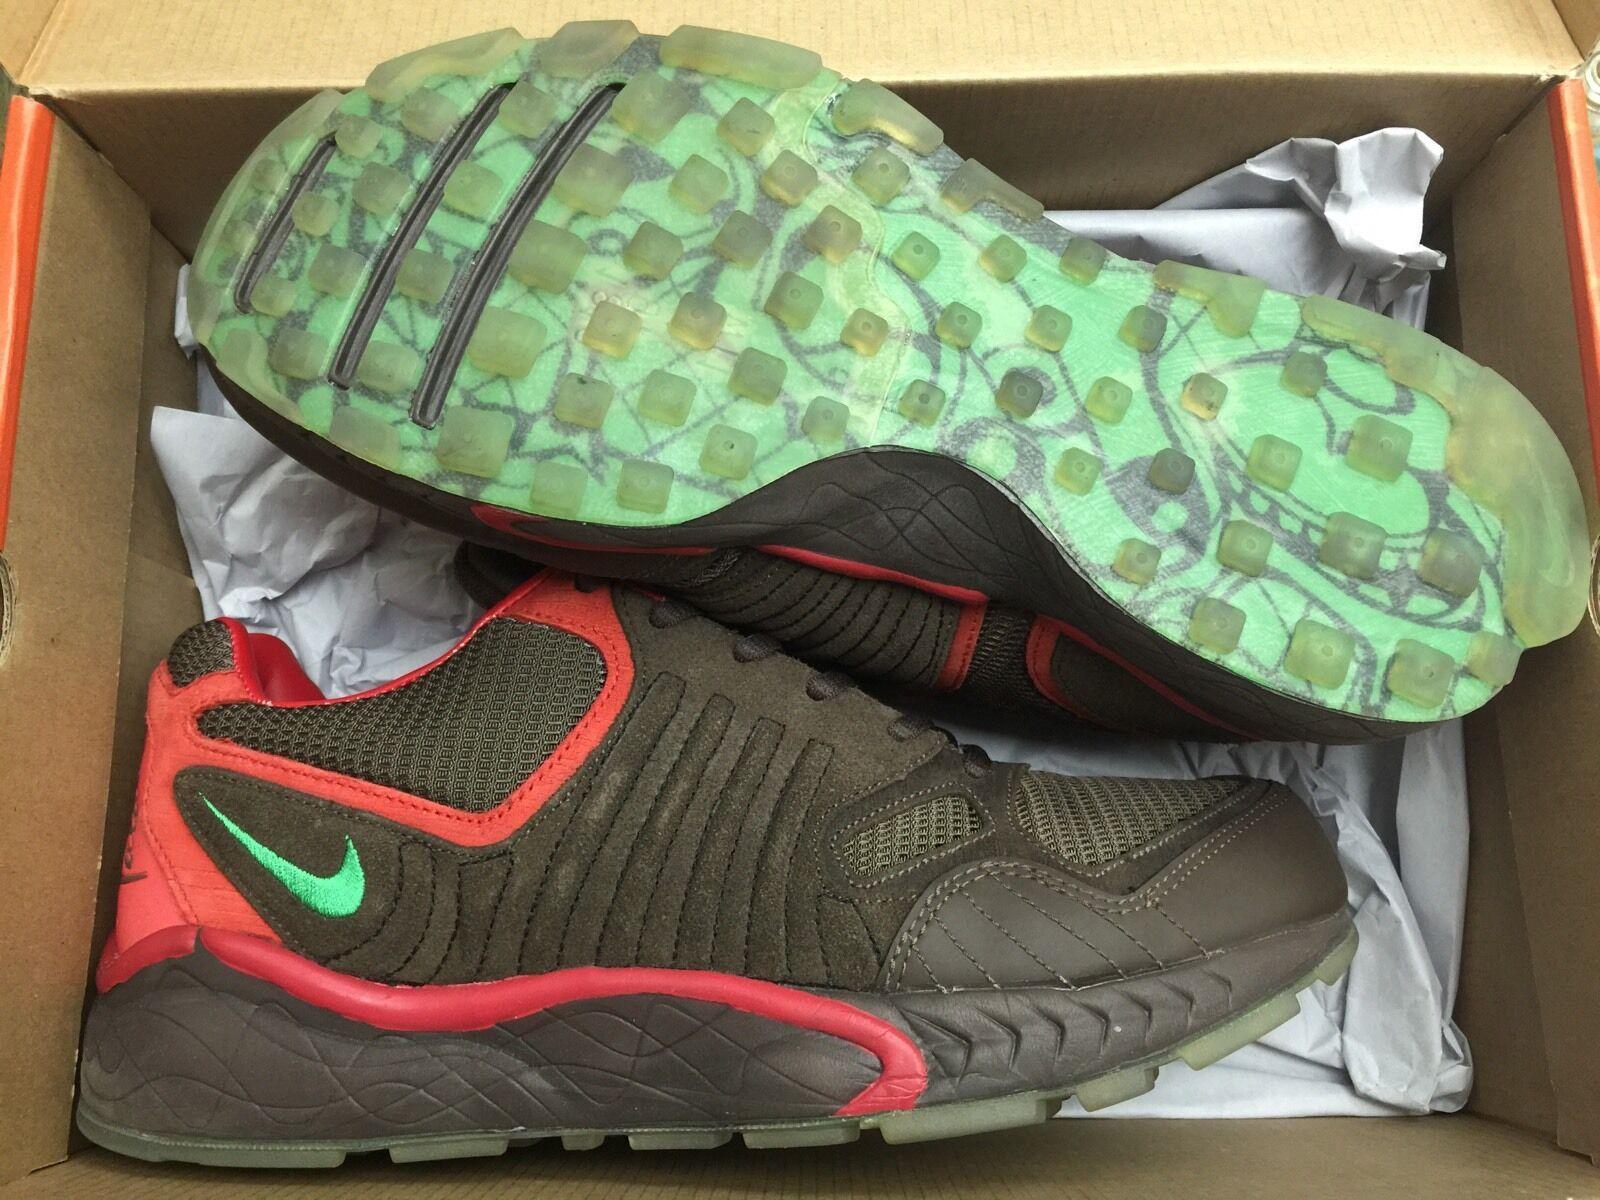 Nike Air Talaria 9.5 Os Gemeos Tier0 Clerks Doernbecher Jordan Atmos Powerwall